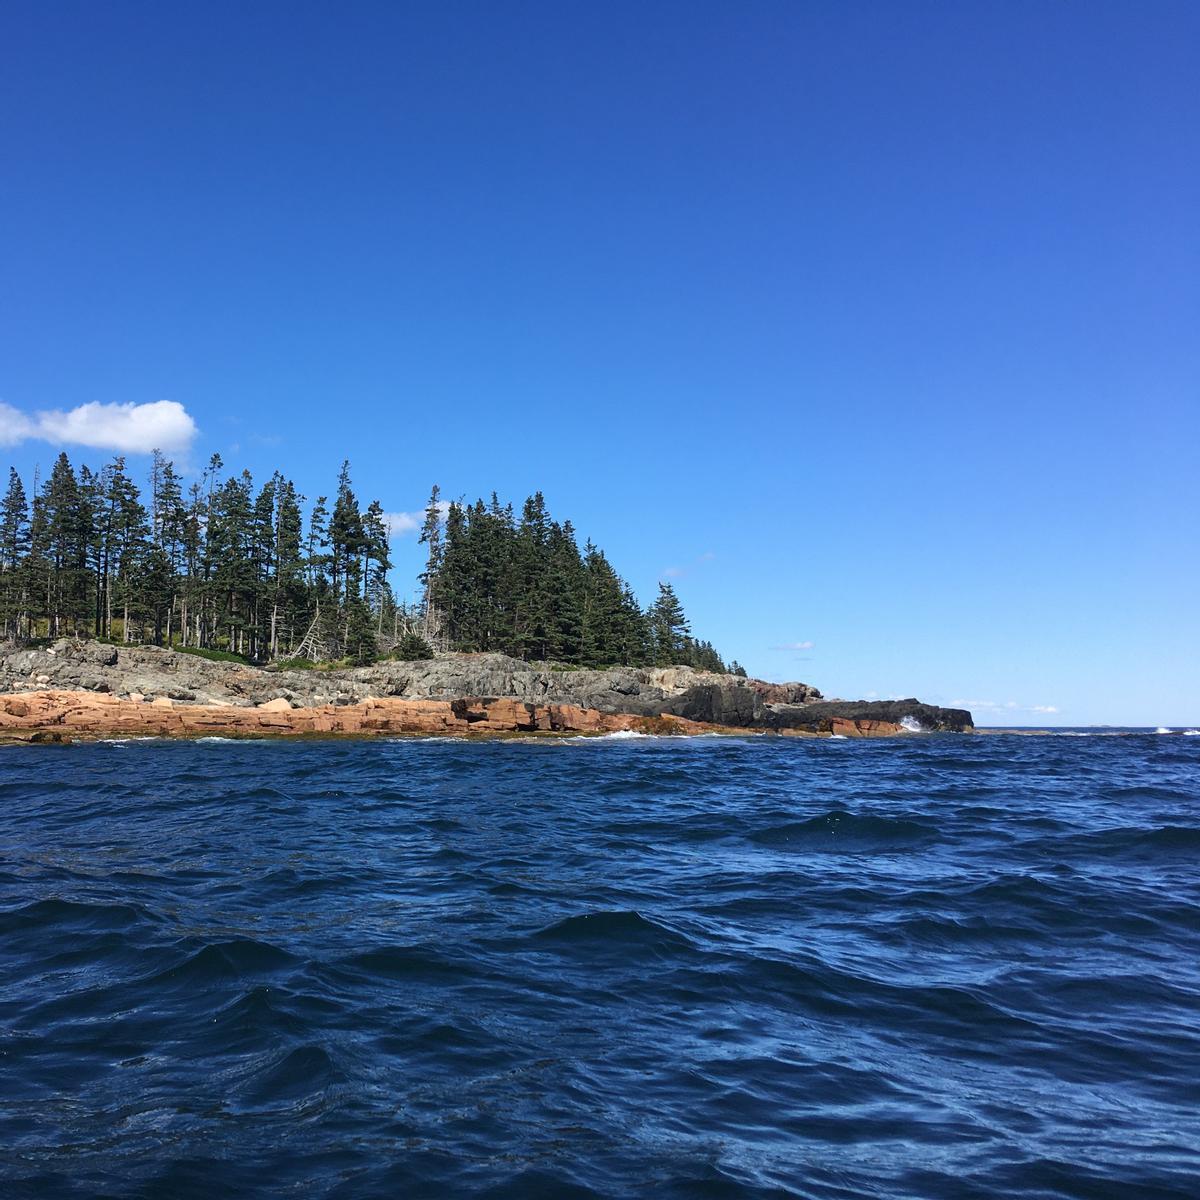 Mid-sized waves crash on a rocky peninsula.